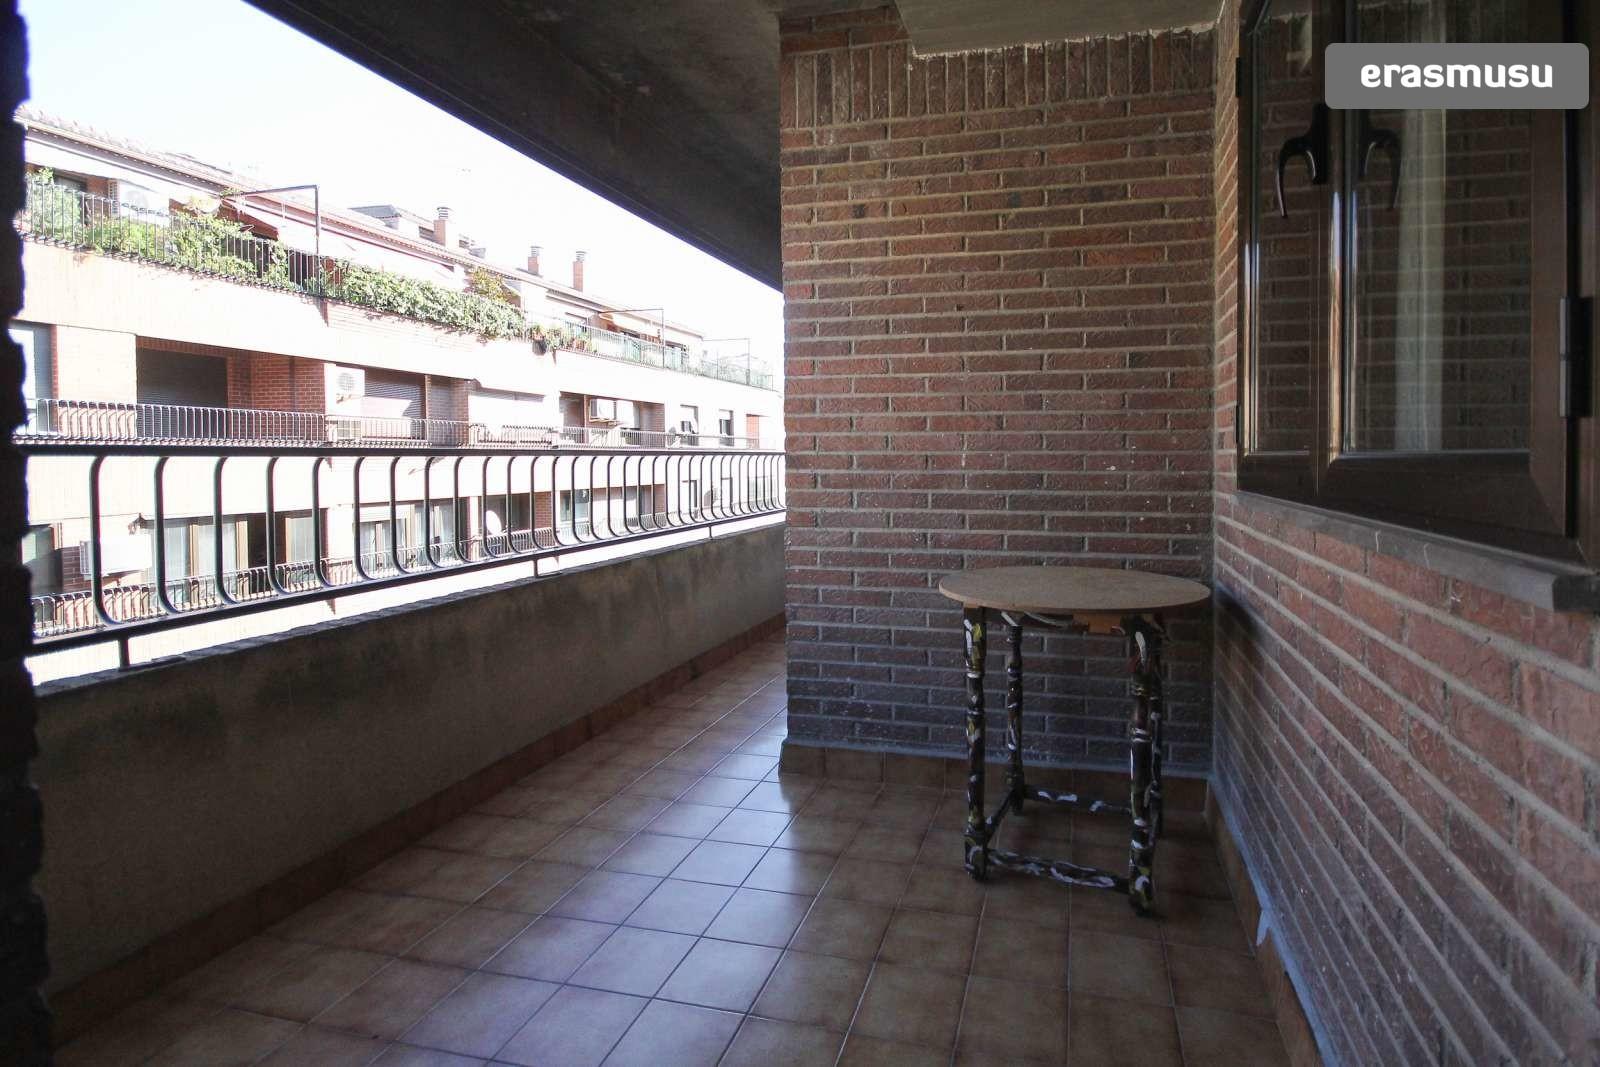 calle-socrates-3f80571a7e1e7fa6d7ac9ee20736ddfc